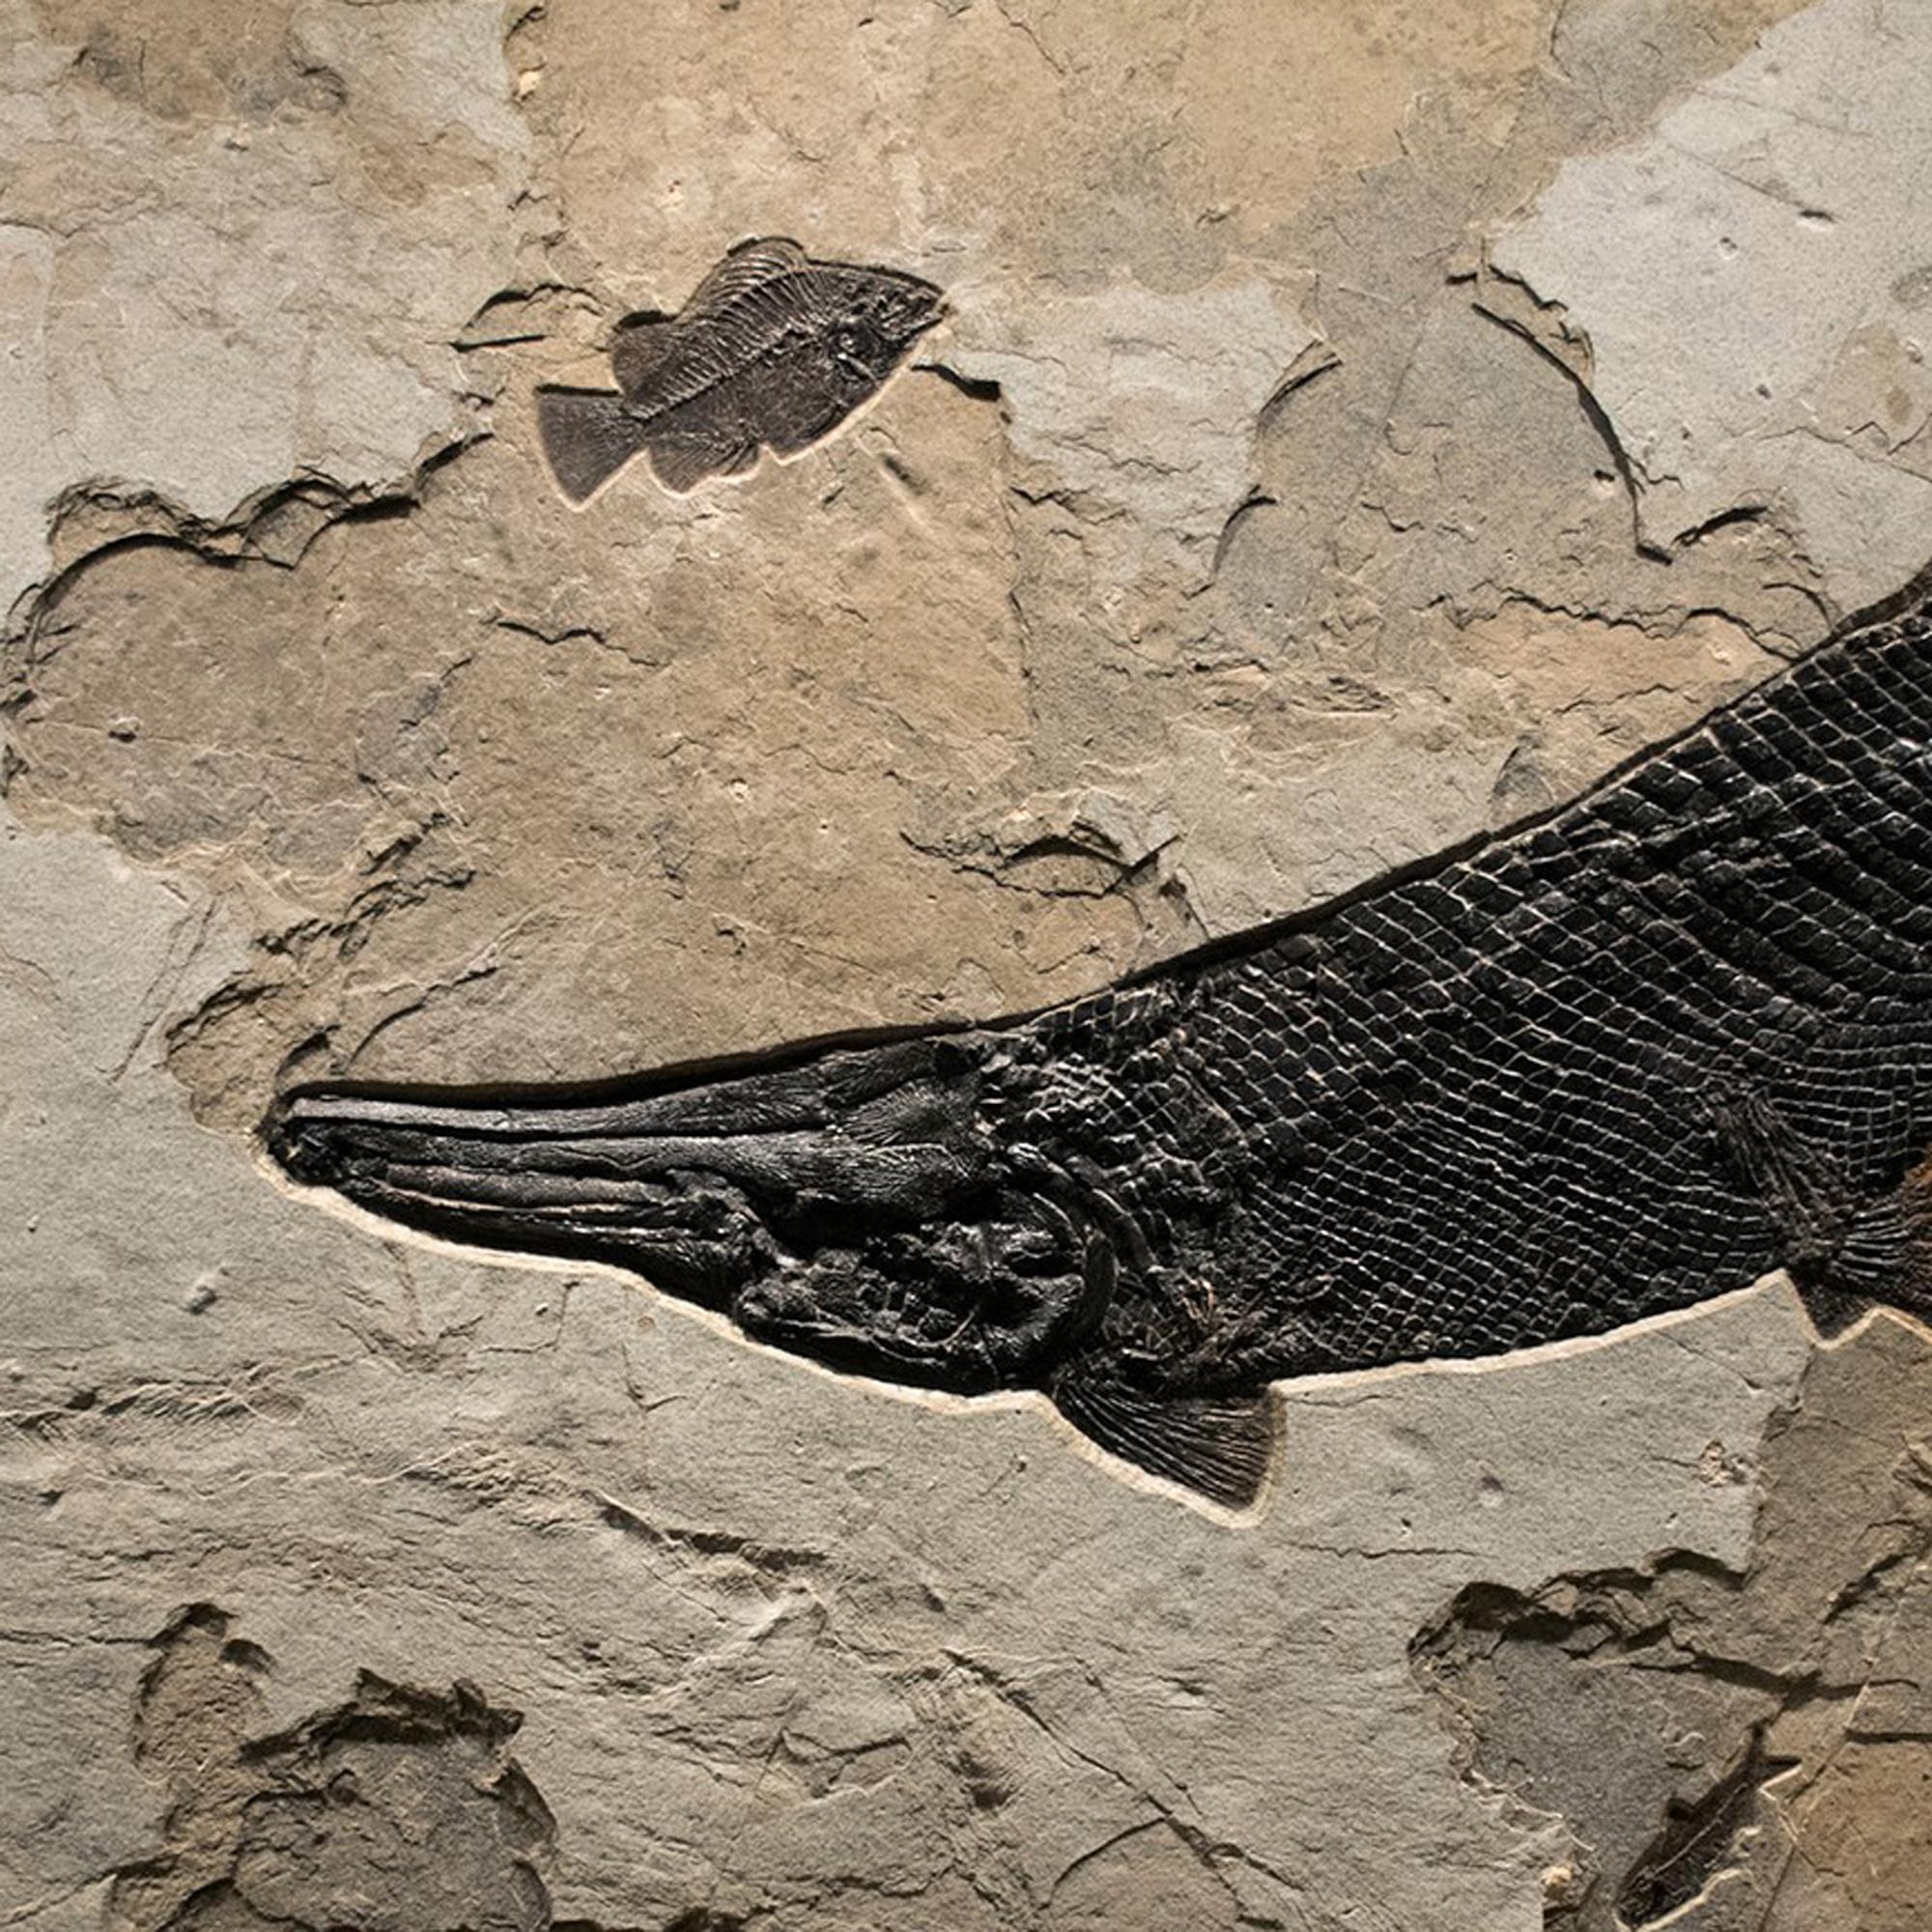 Gar Fish Fossil